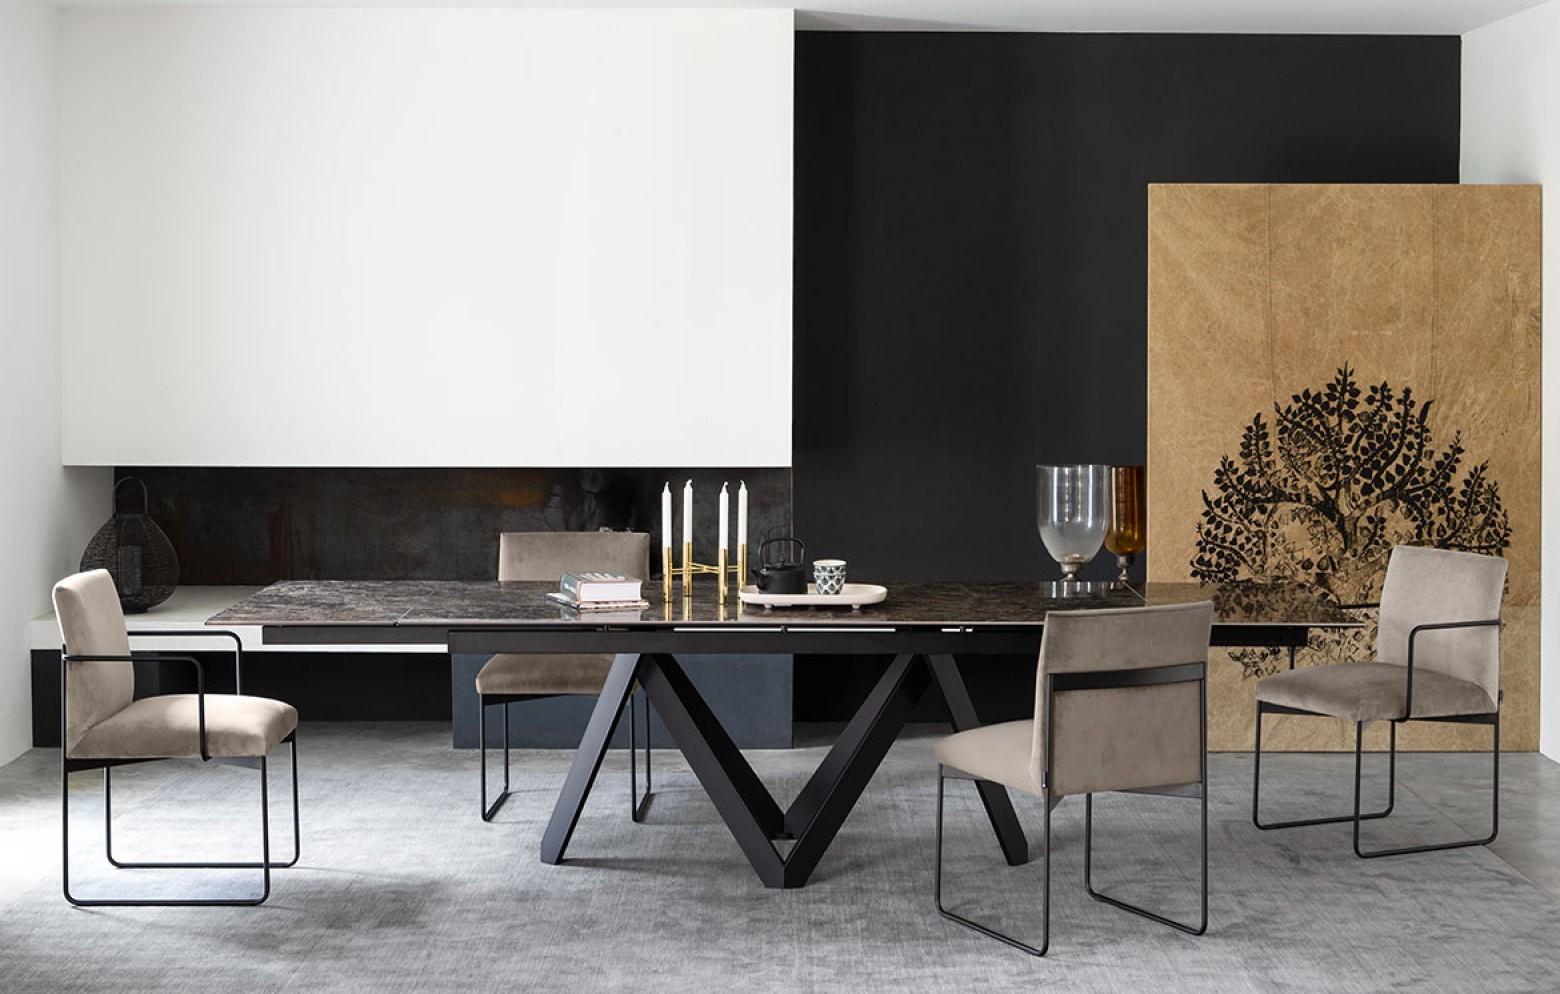 gala stuhl st hle tische st hle who 39 s perfect. Black Bedroom Furniture Sets. Home Design Ideas